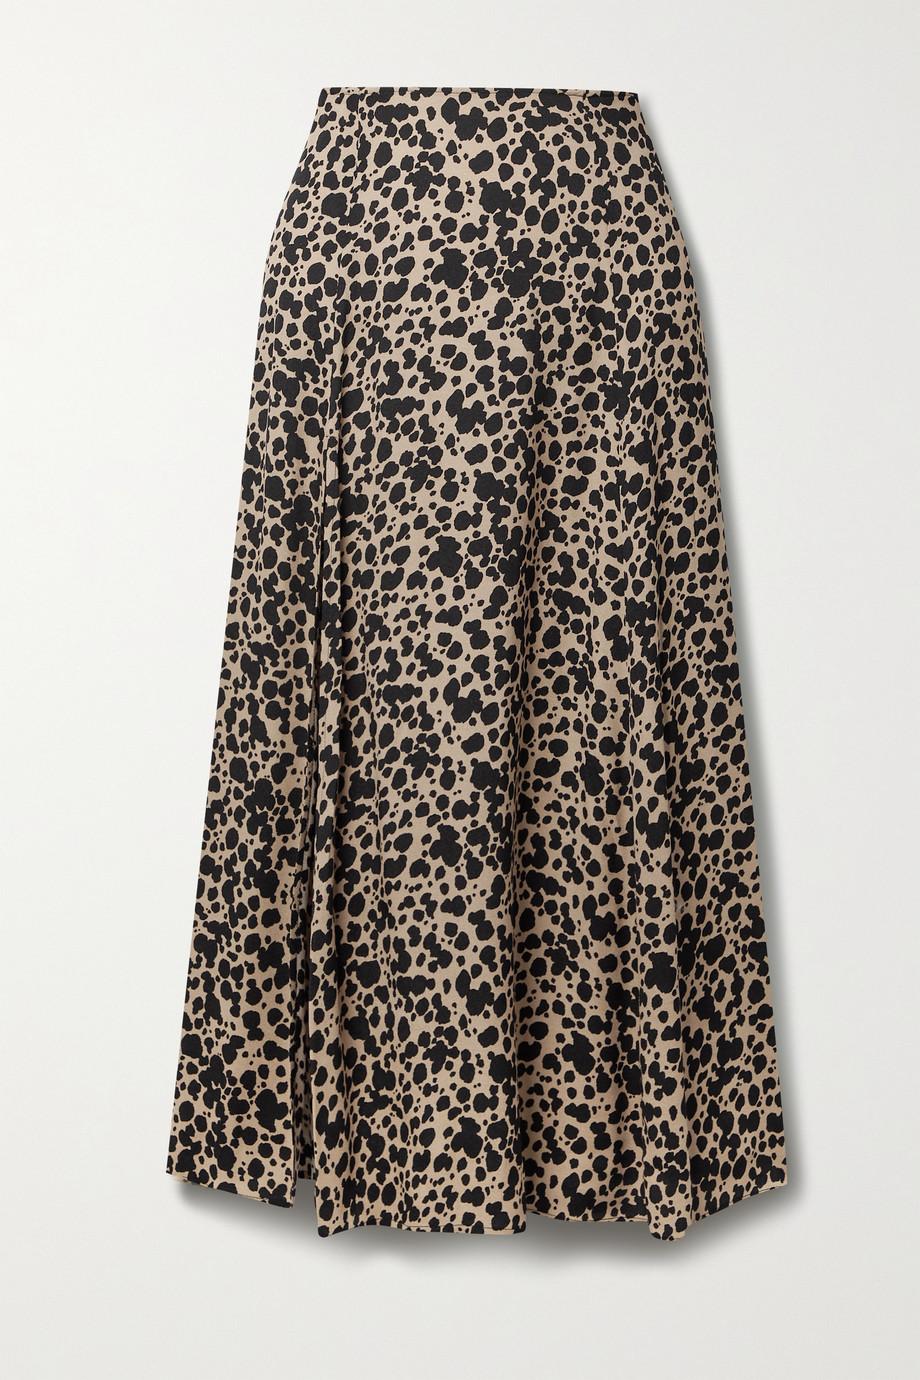 Reformation Zoe leopard-print crepe midi skirt